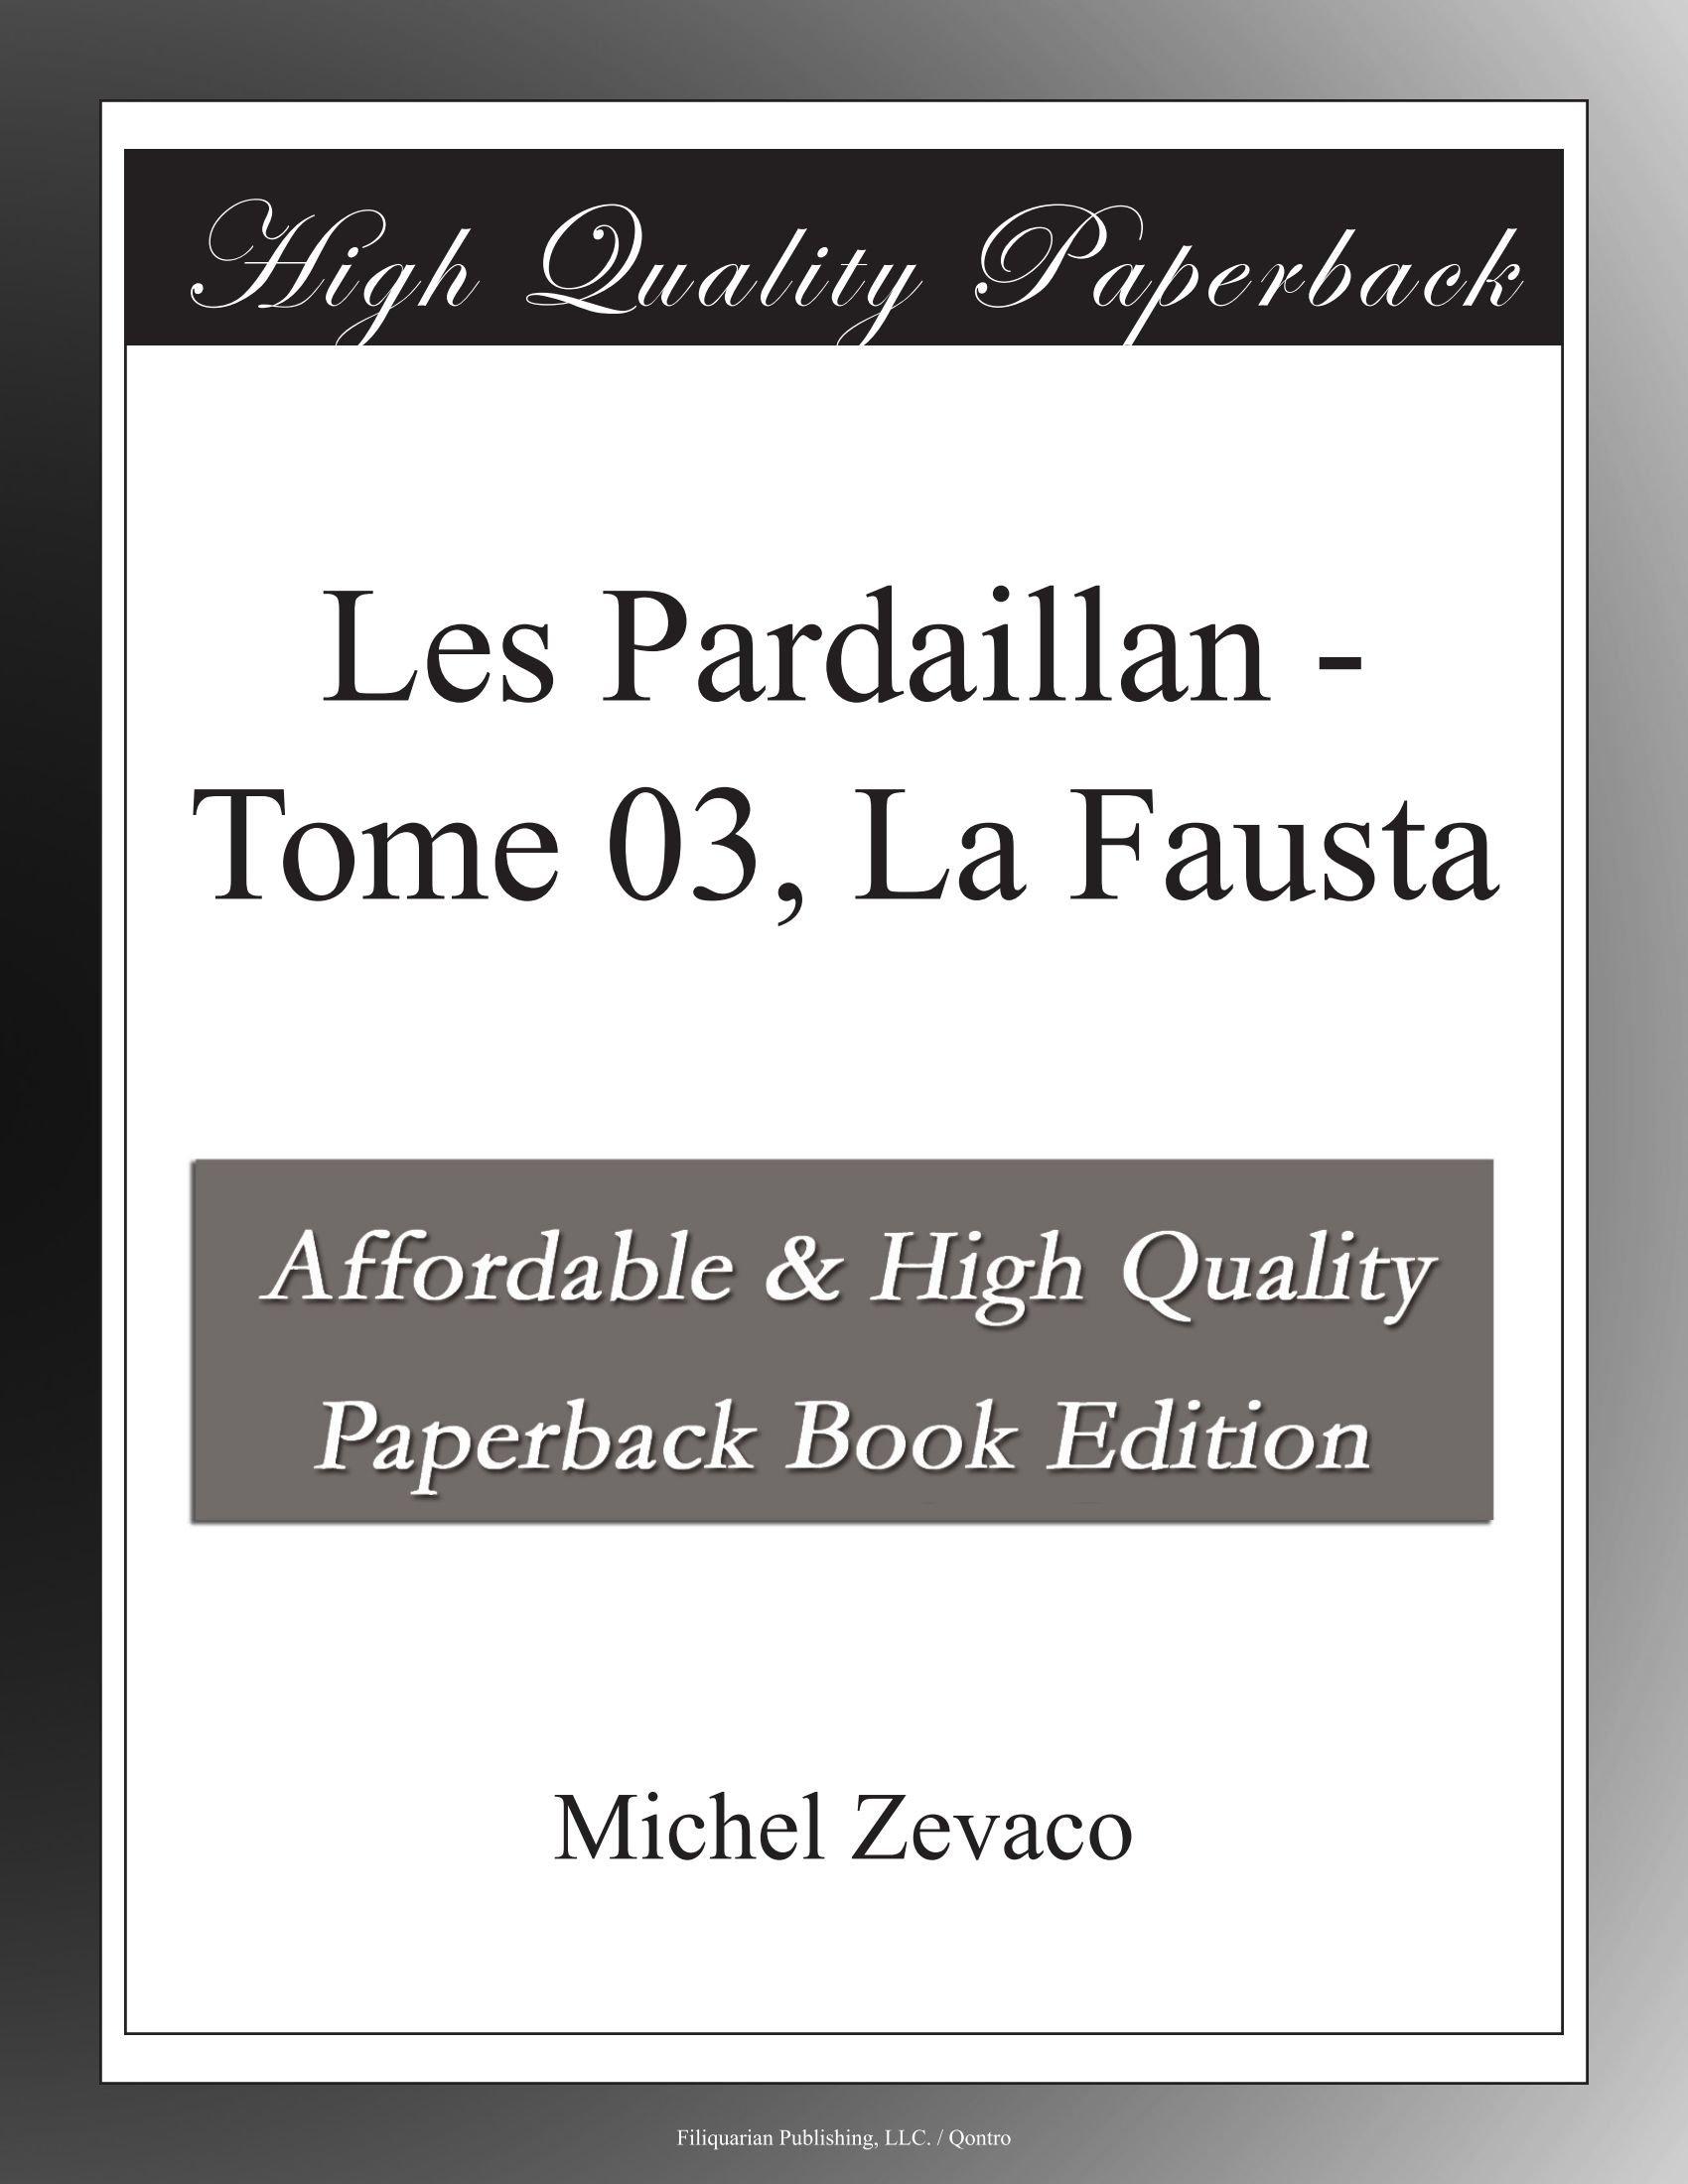 Les Pardaillan — Tome 03 : La Fausta